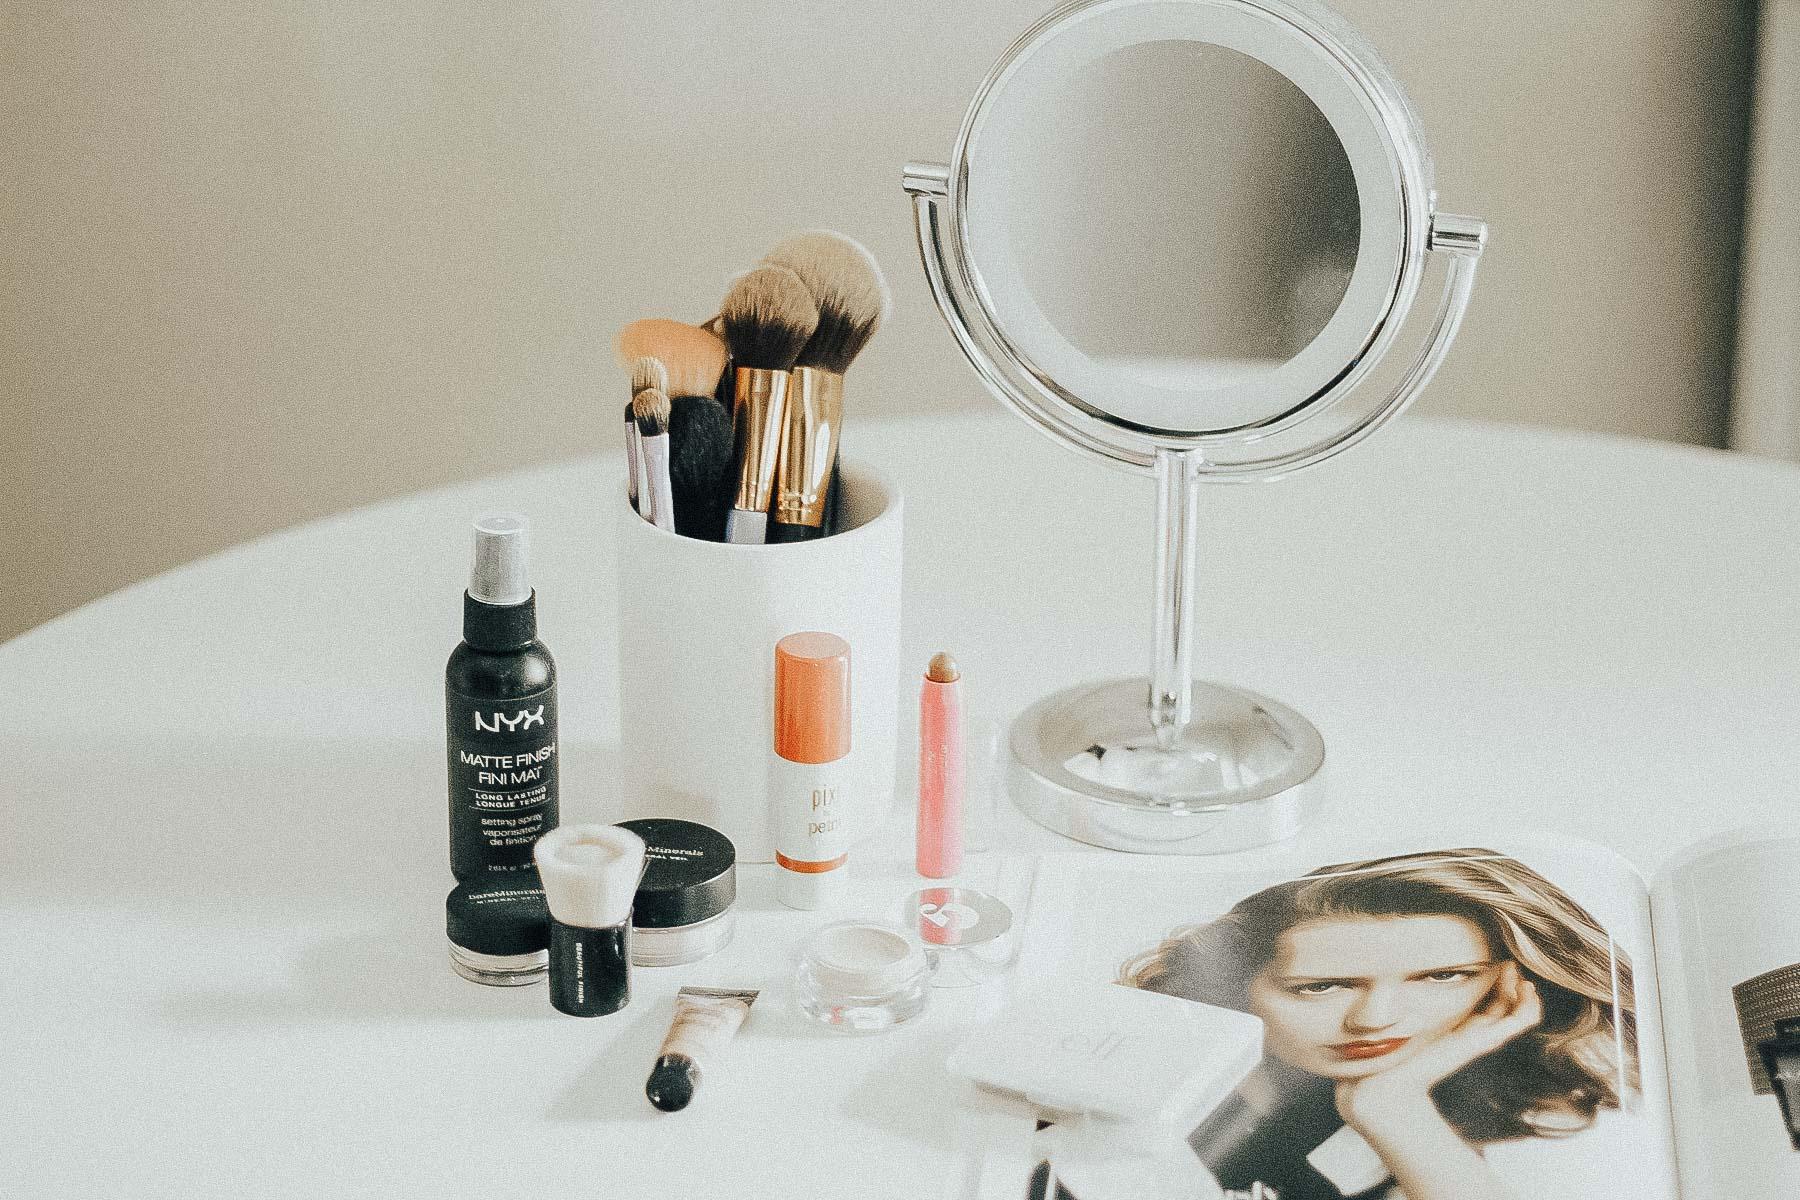 sweat proof makeup